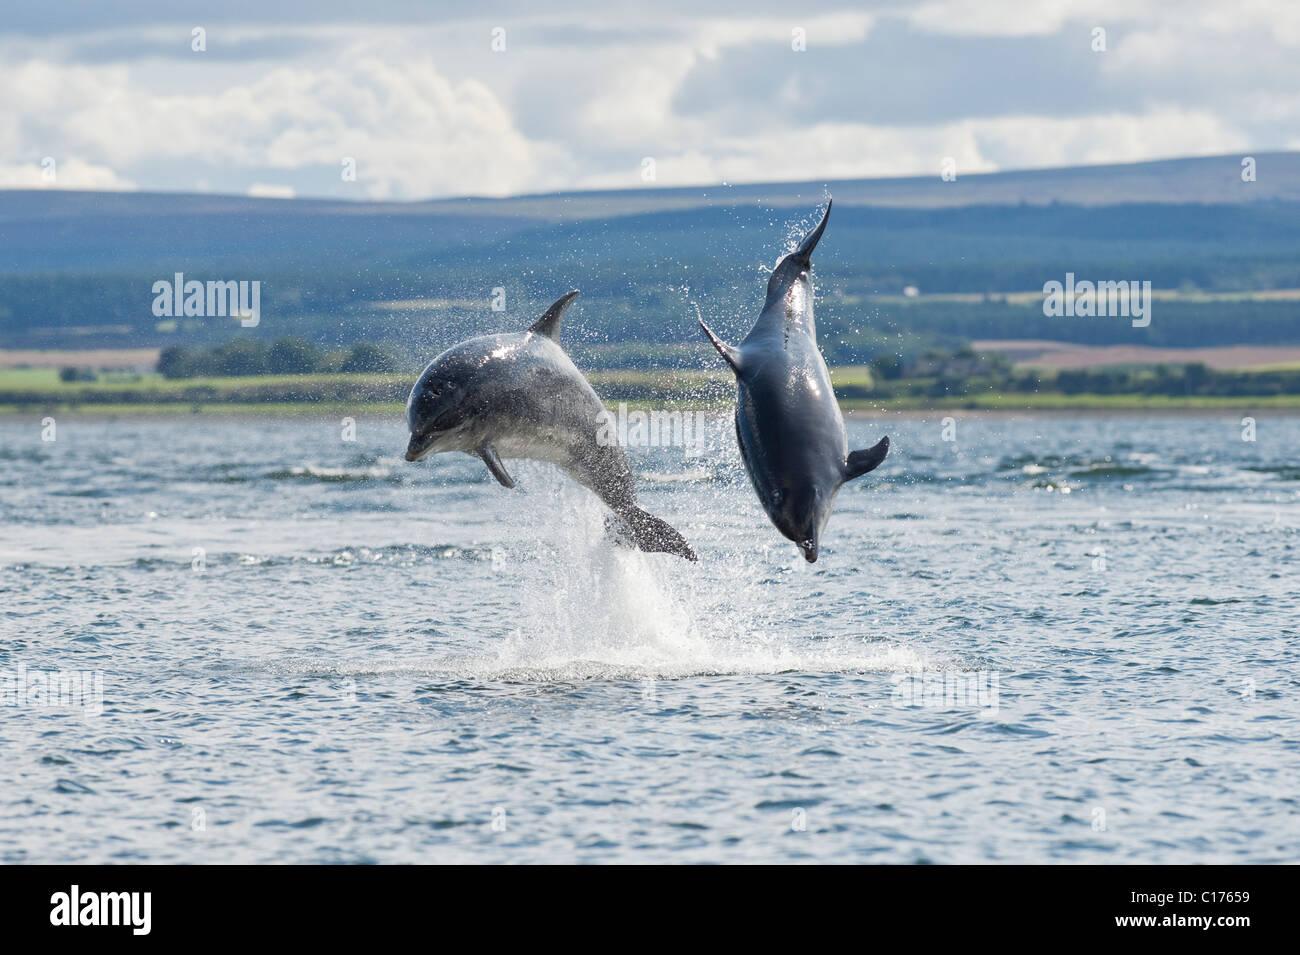 Bottlenose dolphin (Tursiops truncatus) , Moray firth, Scotland, UK. Stock Photo